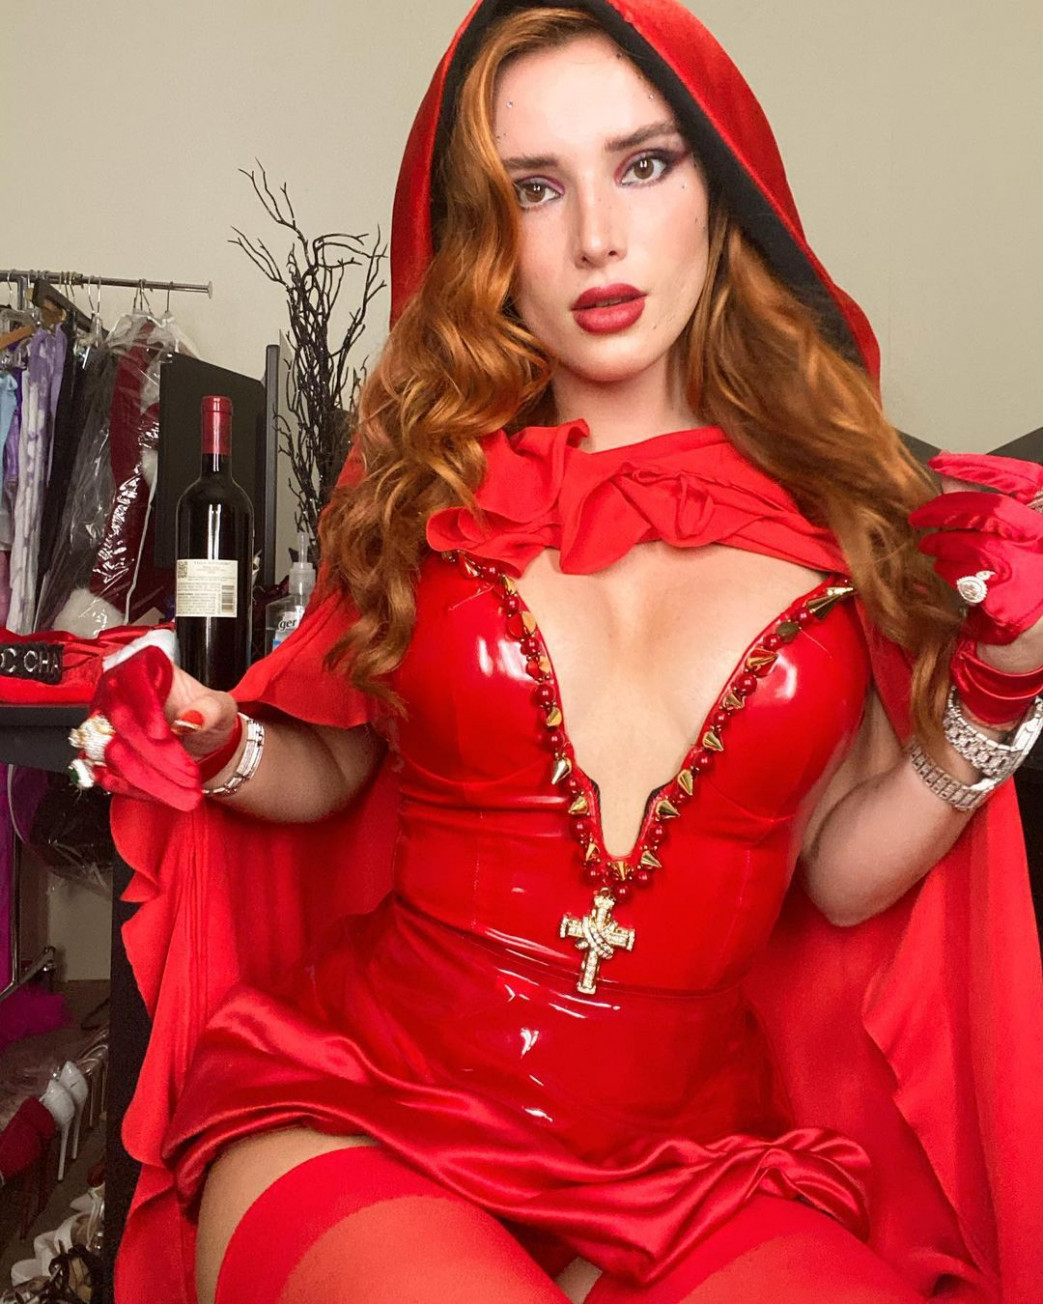 Bella-Thorne-In-Busty-Halloween-Costume-4.jpg